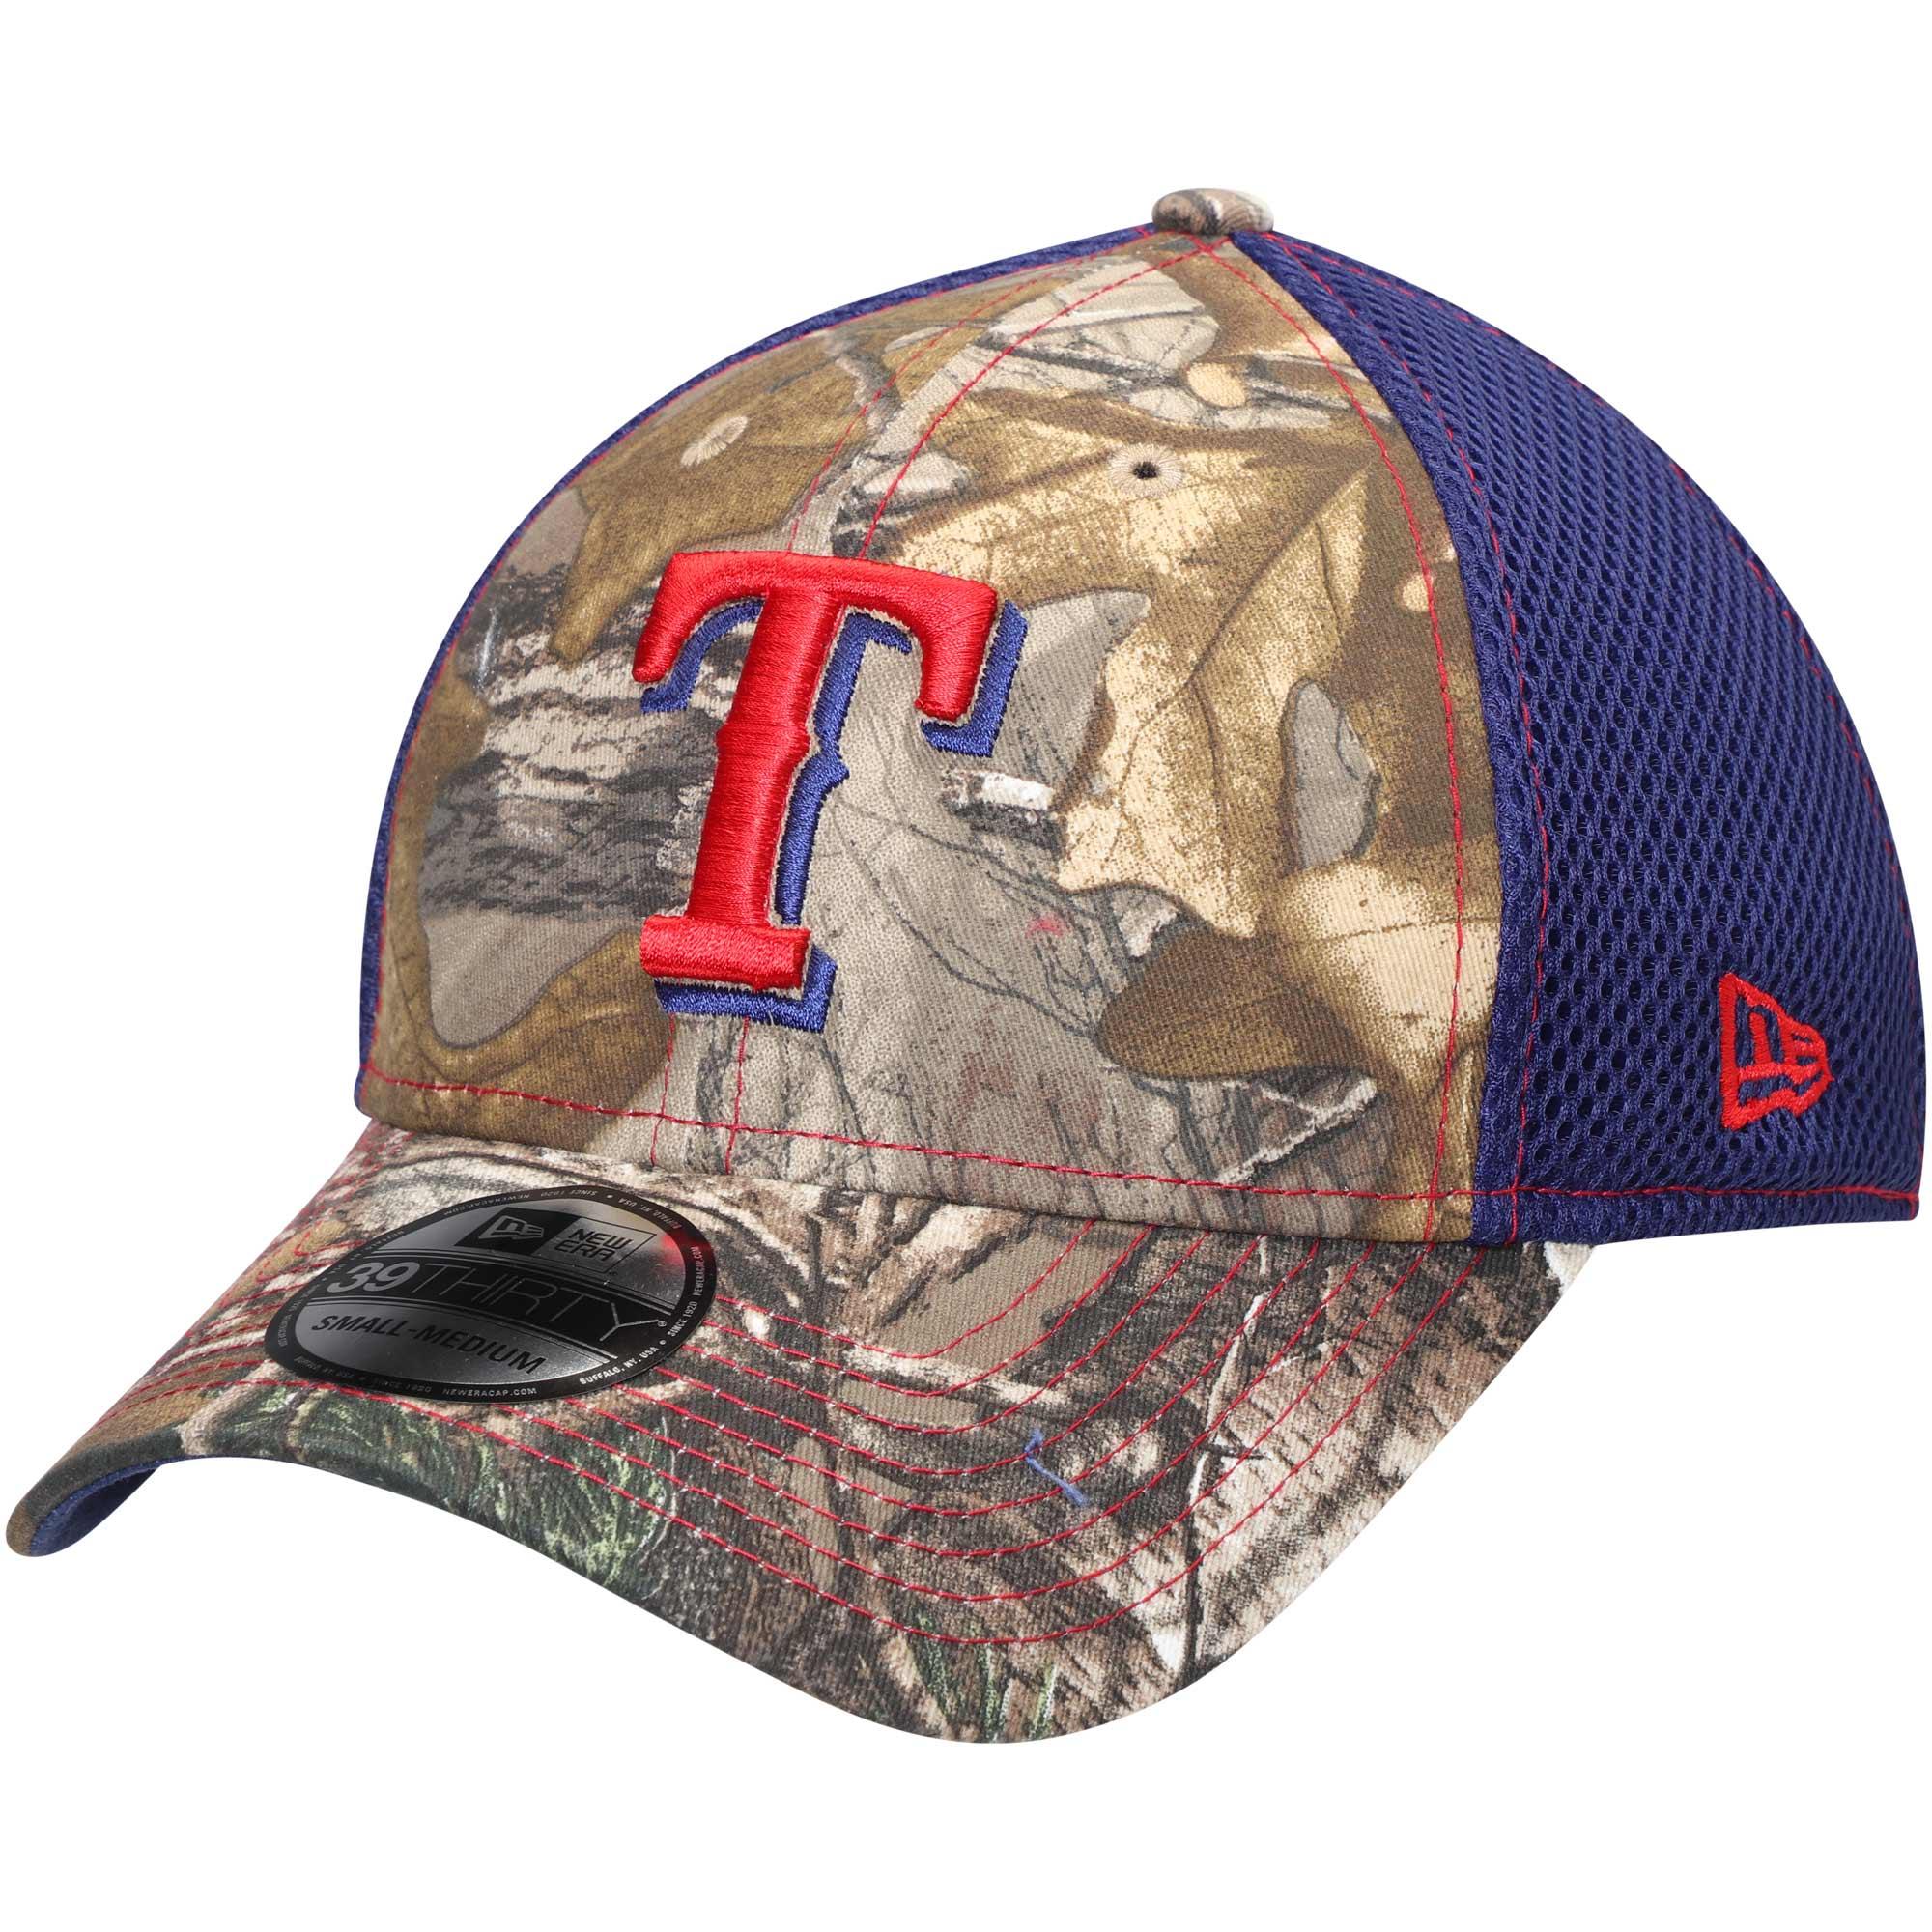 Texas Rangers New Era Neo 39THIRTY Flex Hat - Realtree Camo